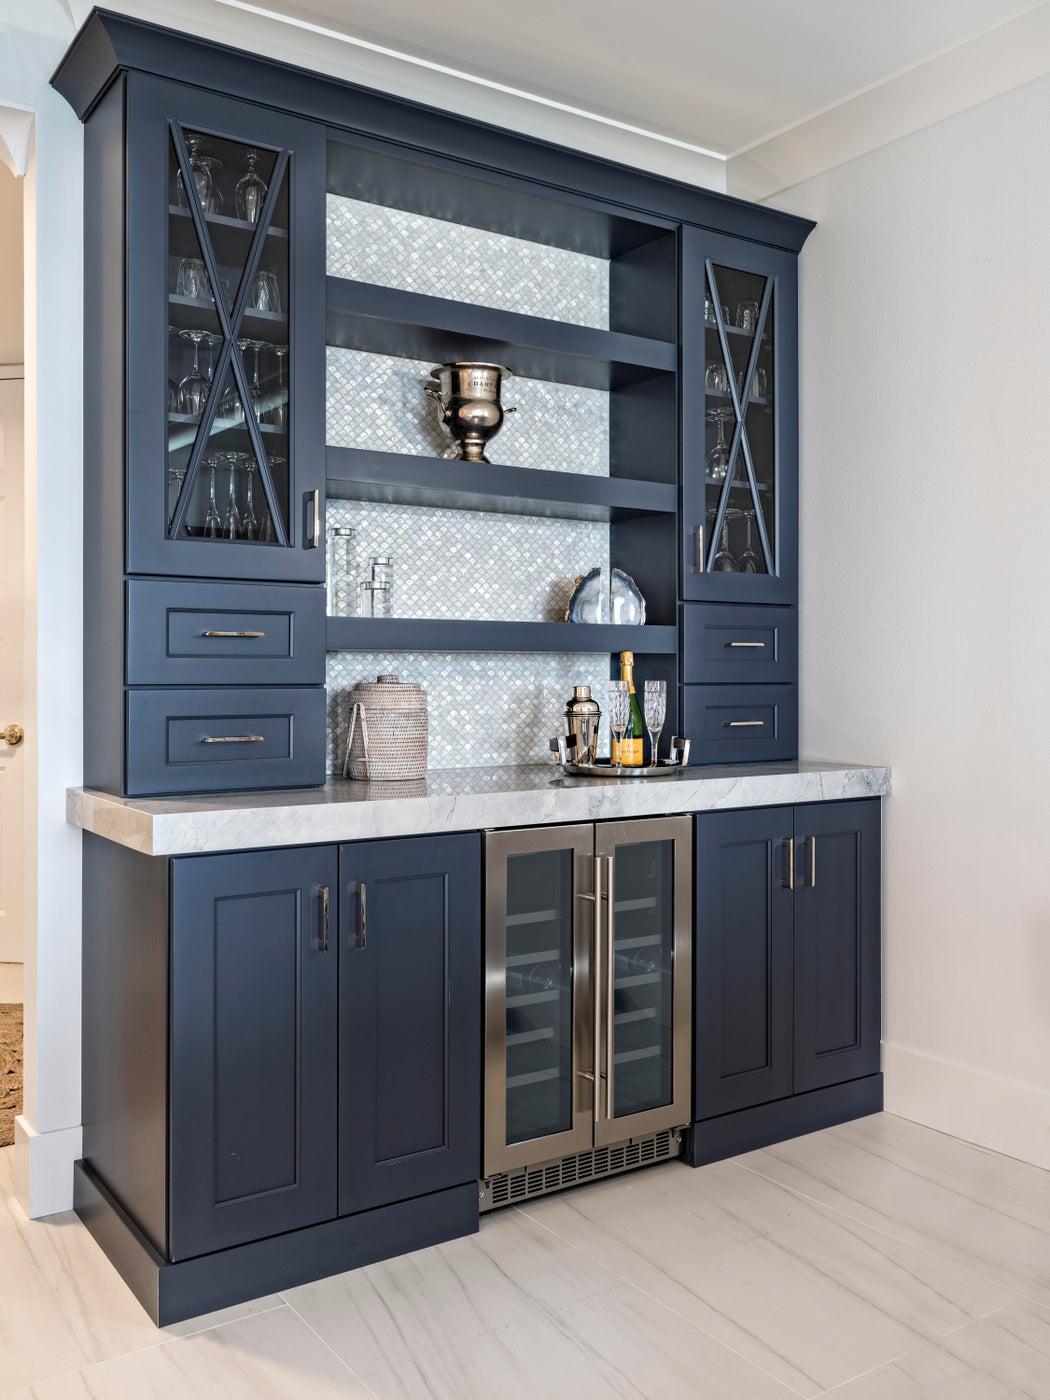 This Custom hale navy bar evokes coastal design and has the perfect mother of pearl backsplash tile.